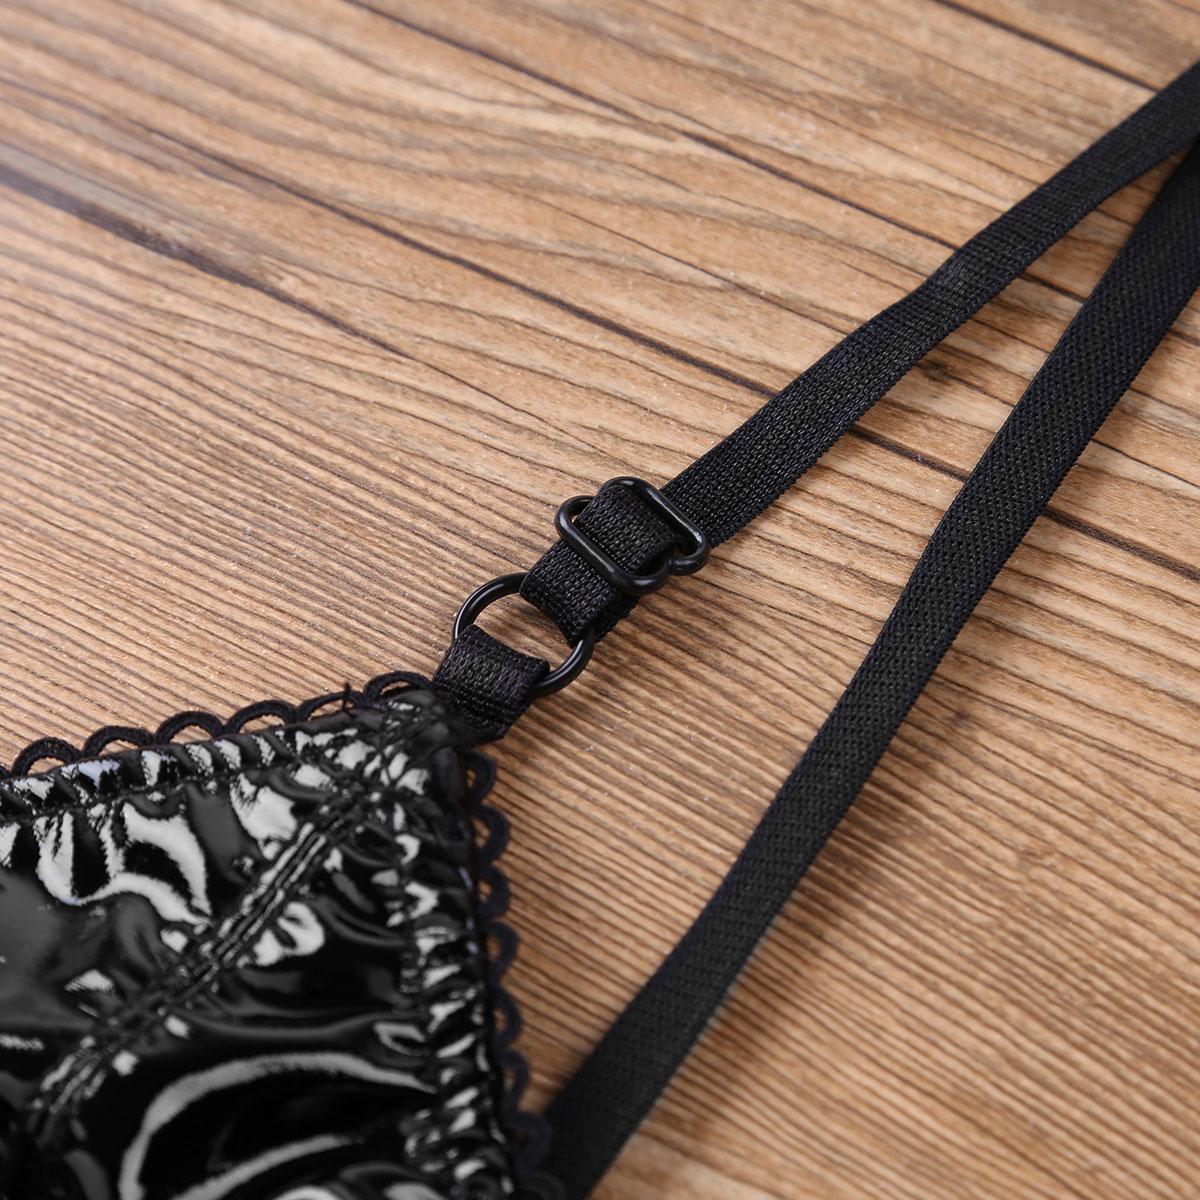 iiniim Womens Adjustable Spaghetti Straps Open Cup Bra Hole Lingerie Clubwear Faux Leather Vintage with Nipple Splits Bra Top